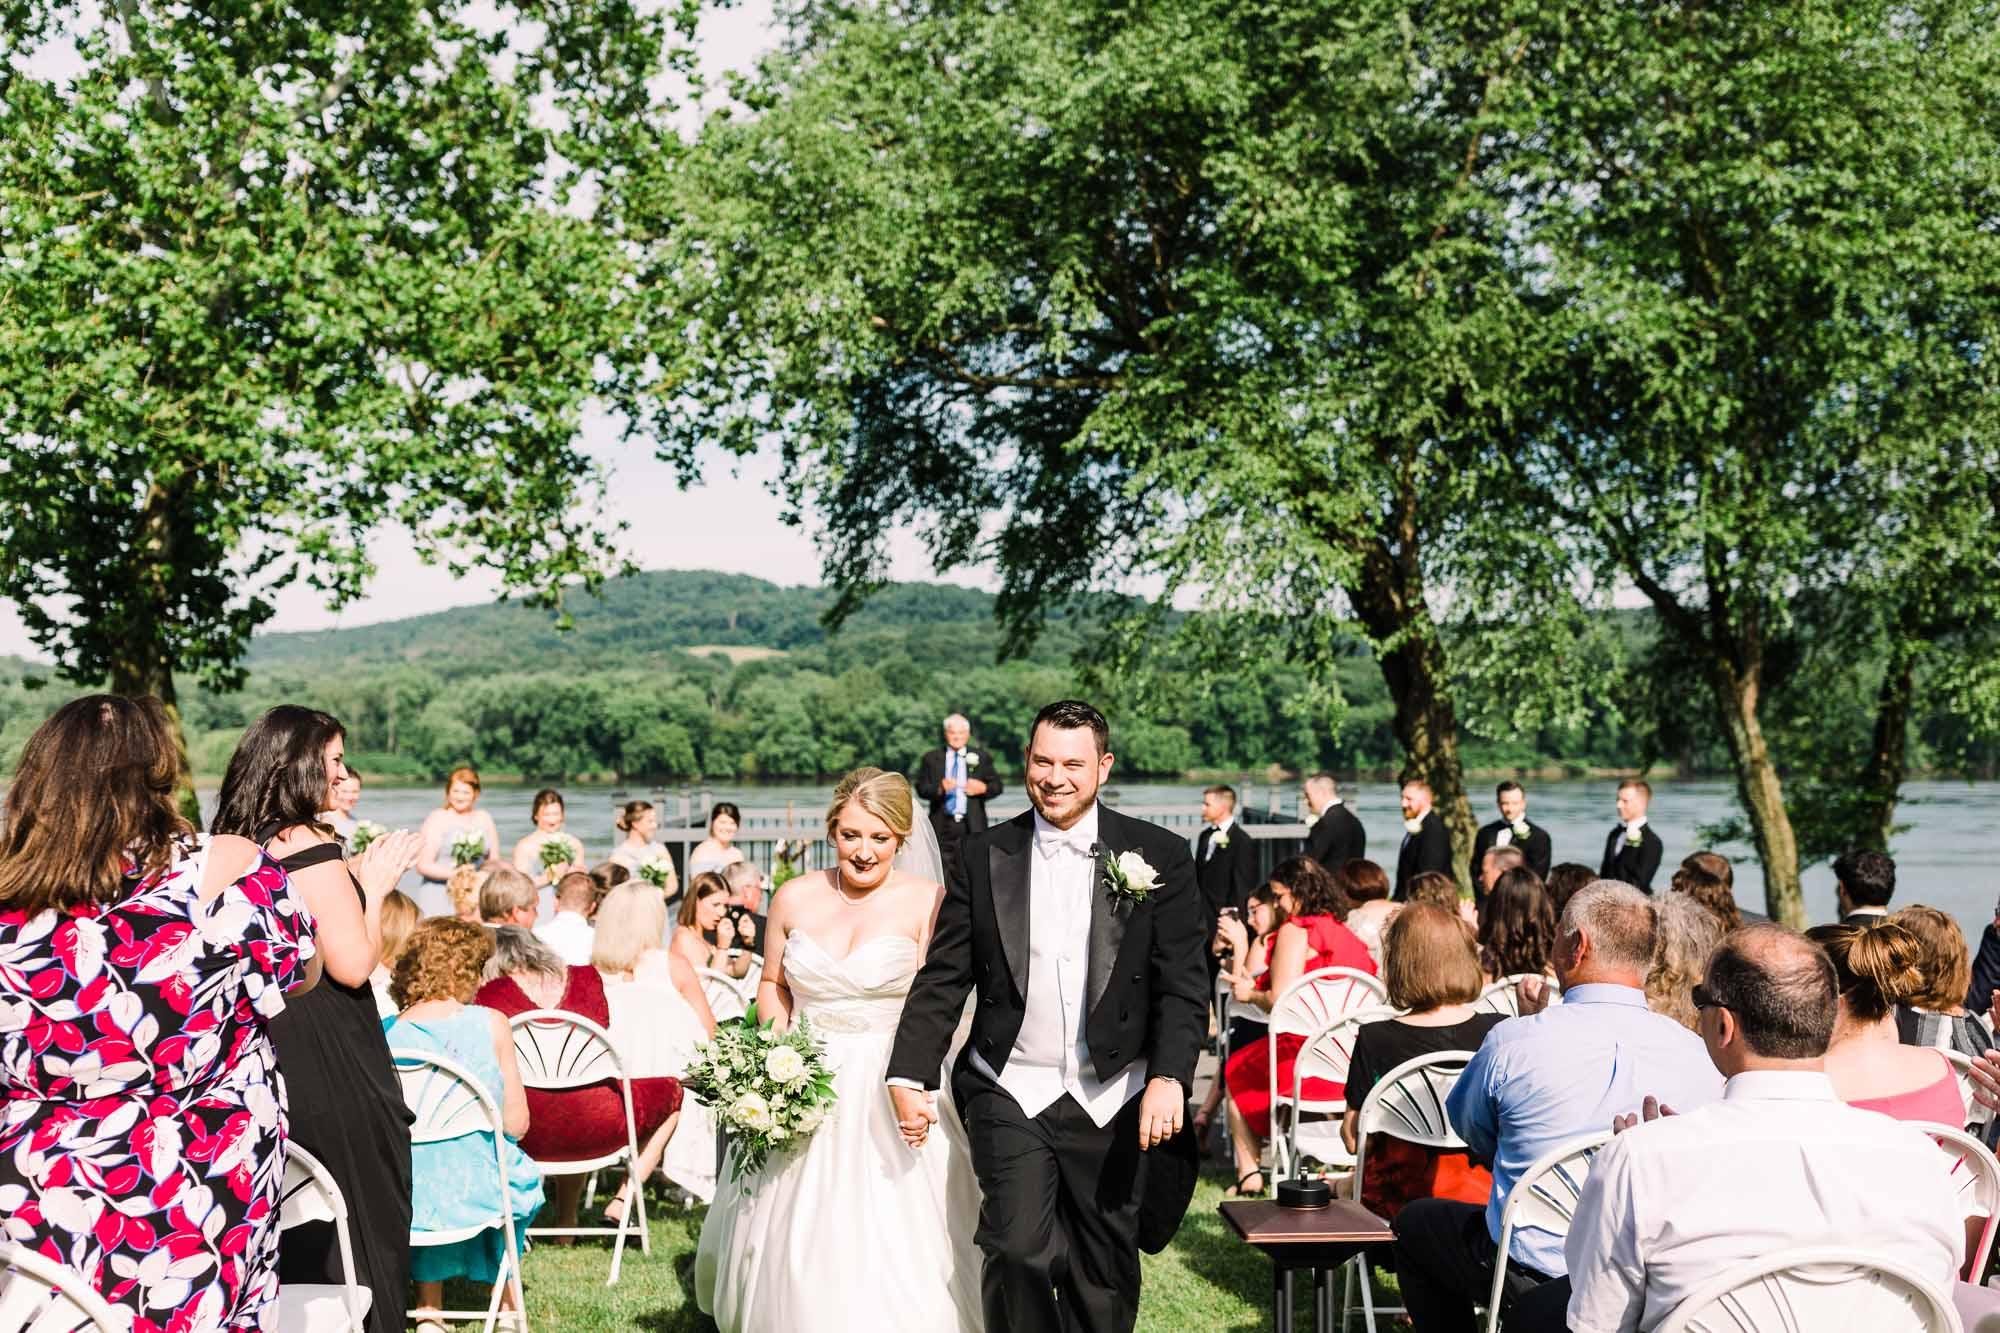 isle-of-que-wedding-6744.jpg